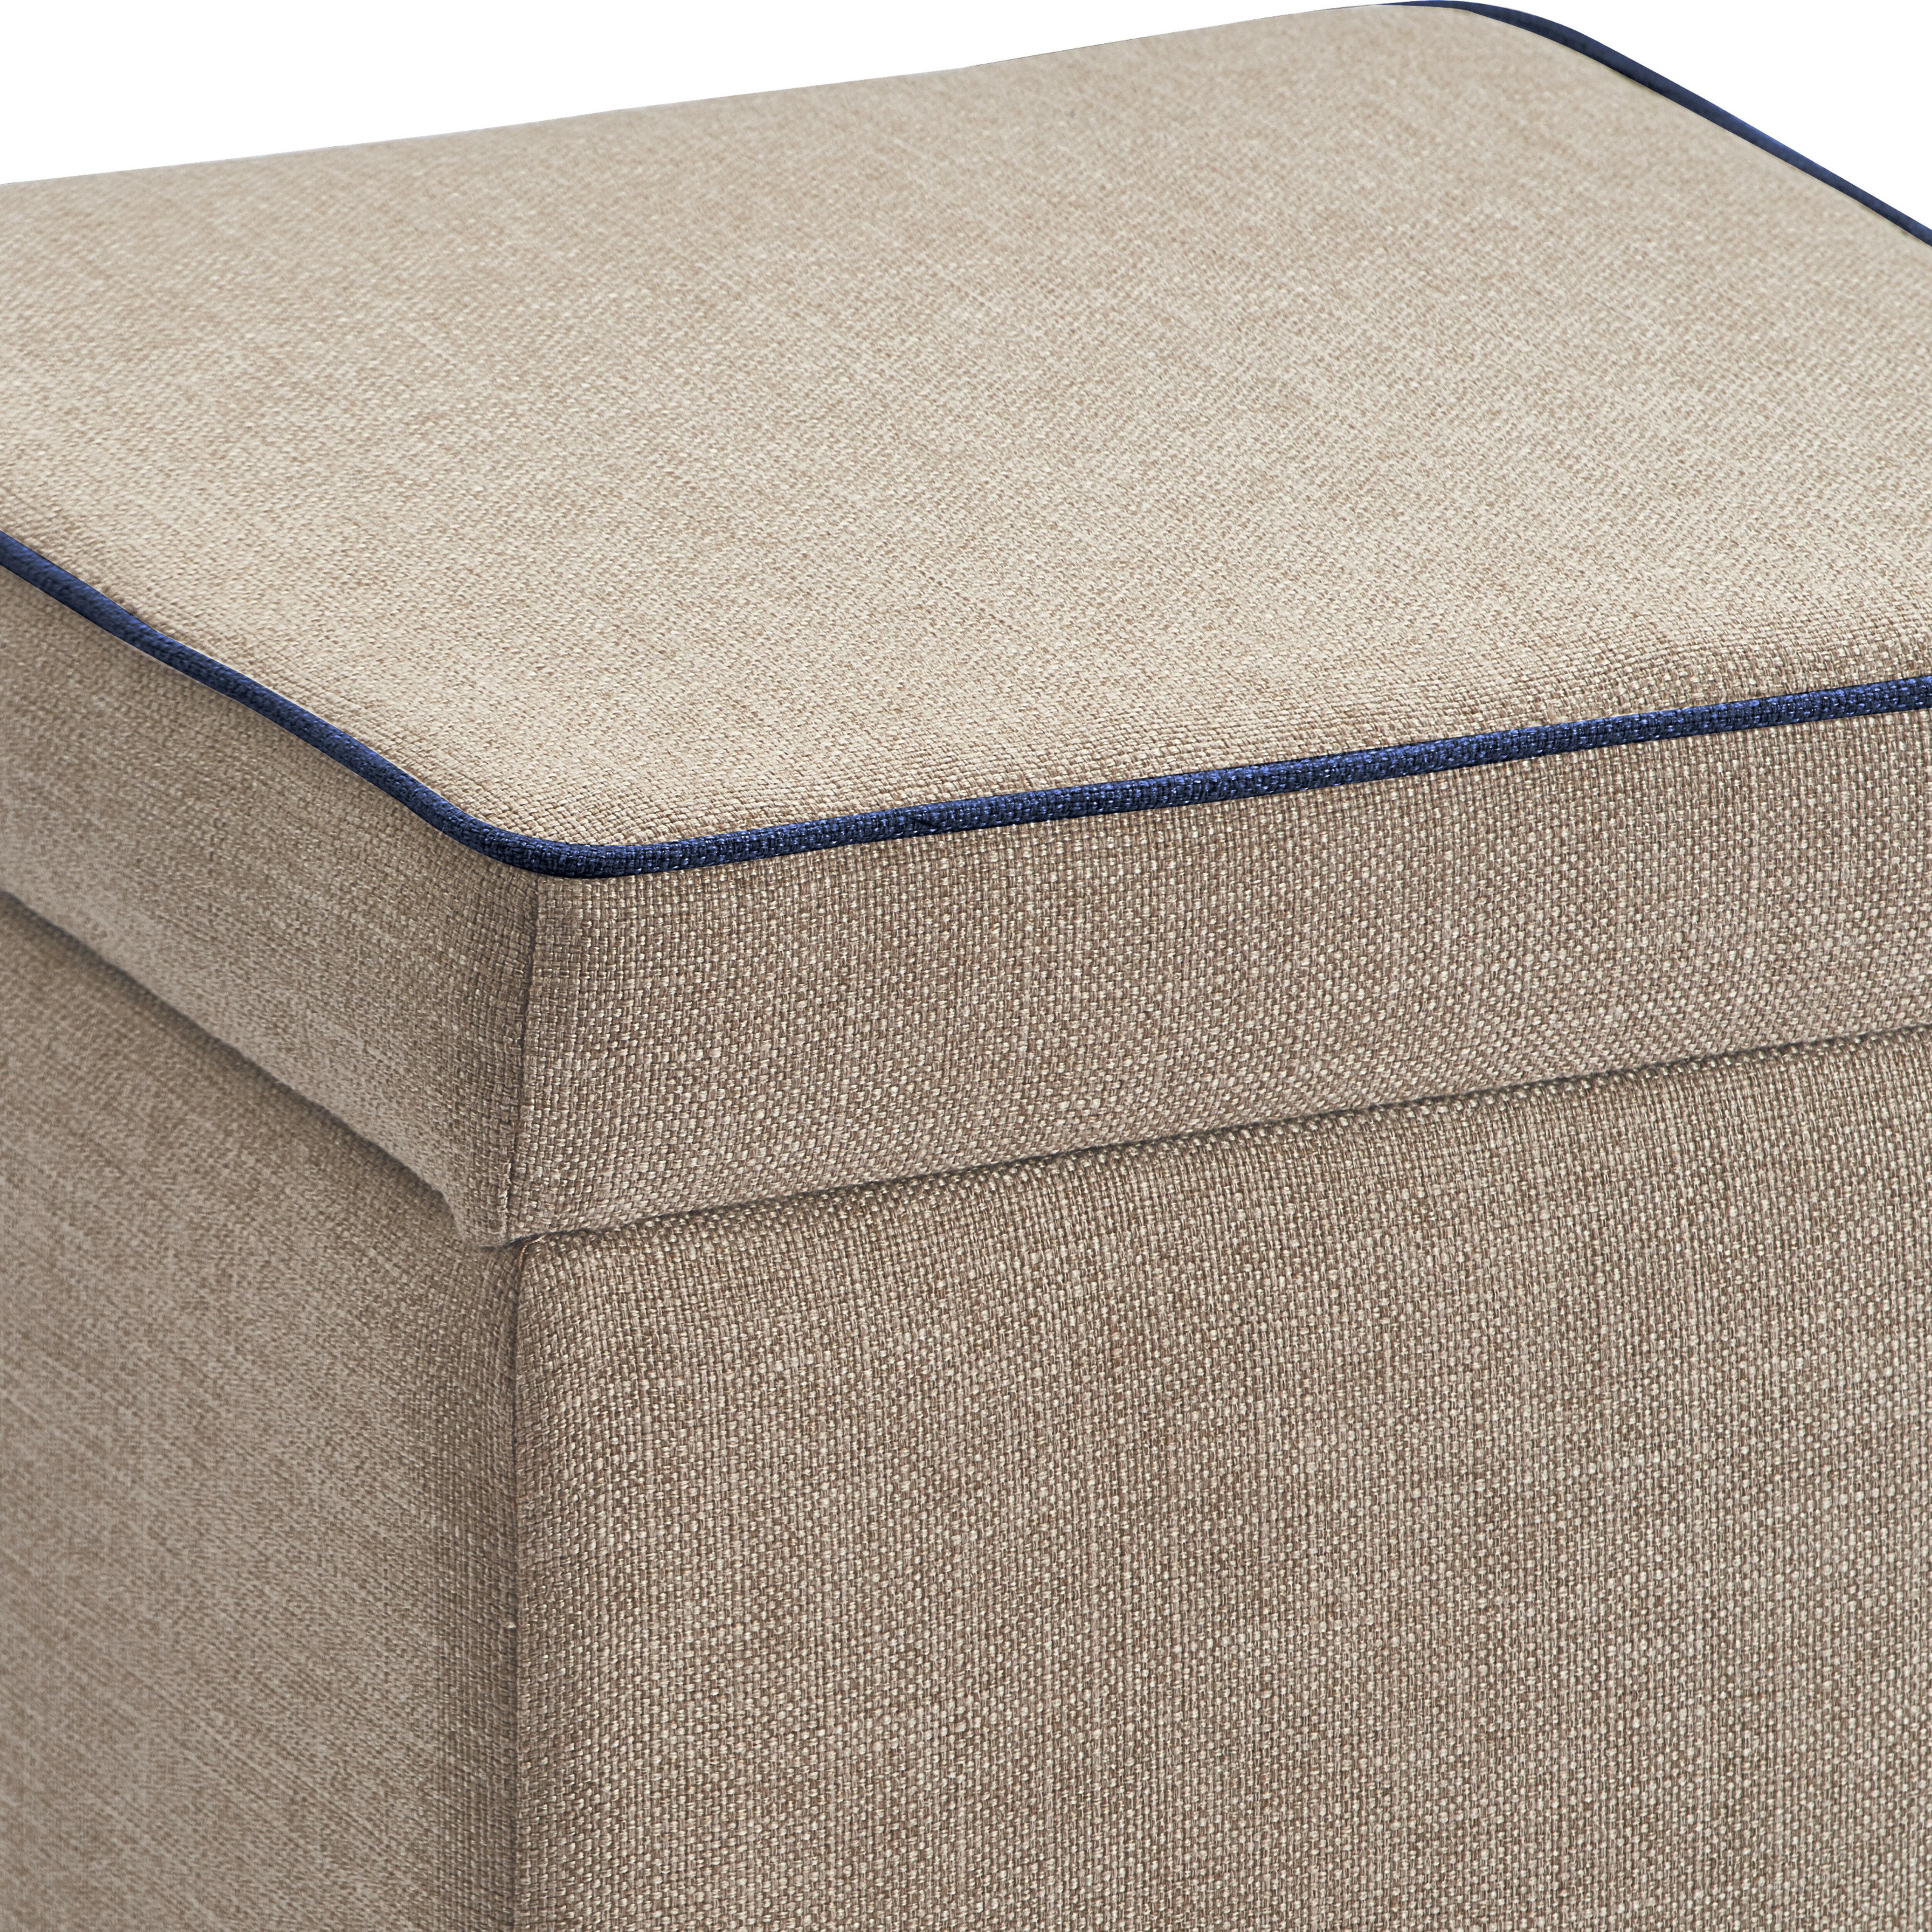 Pleasing Morgan Storage Ottoman Spiritservingveterans Wood Chair Design Ideas Spiritservingveteransorg